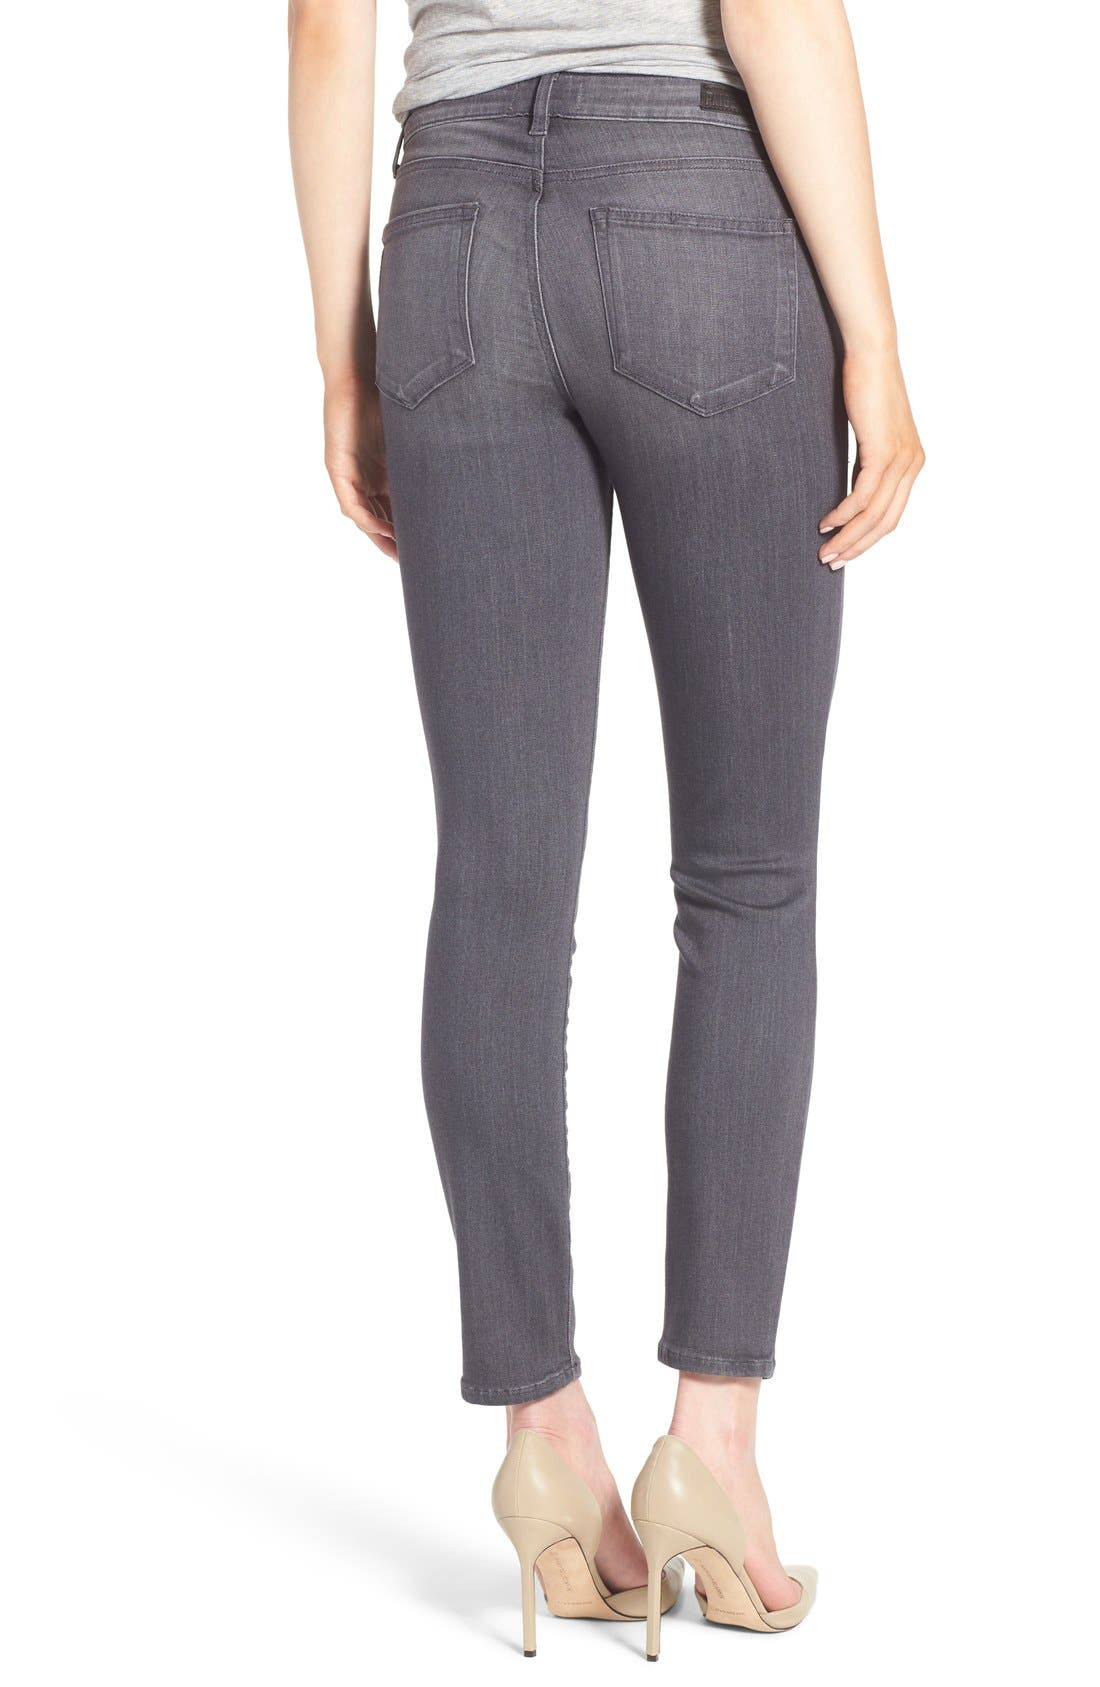 Alternate Image 2  - PAIGE Transcend - Verdugo Ankle Jeans (Bonnie Grey) (Nordstrom Exclusive)